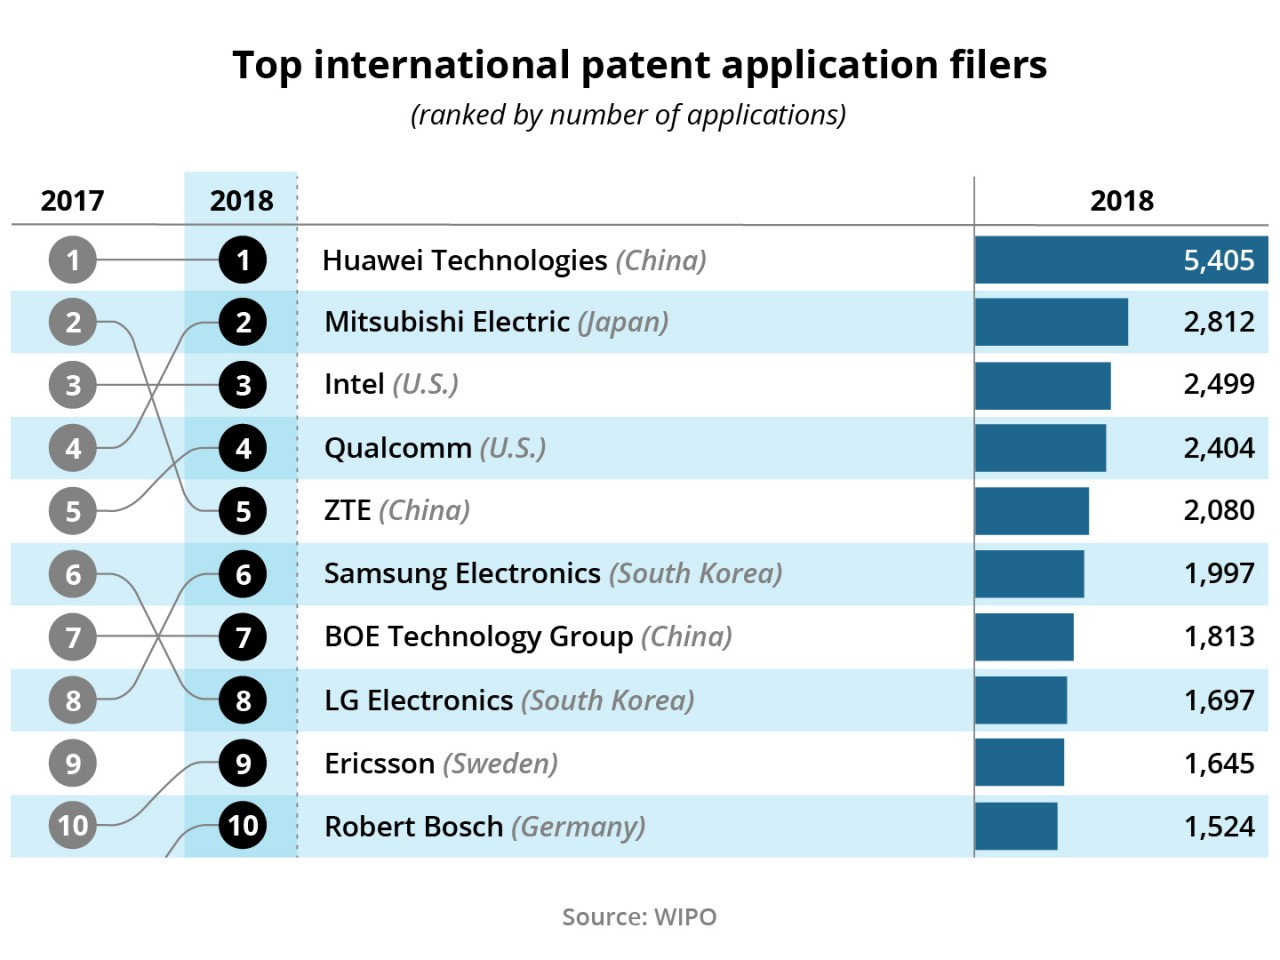 Figure 9: Top international patent application filers